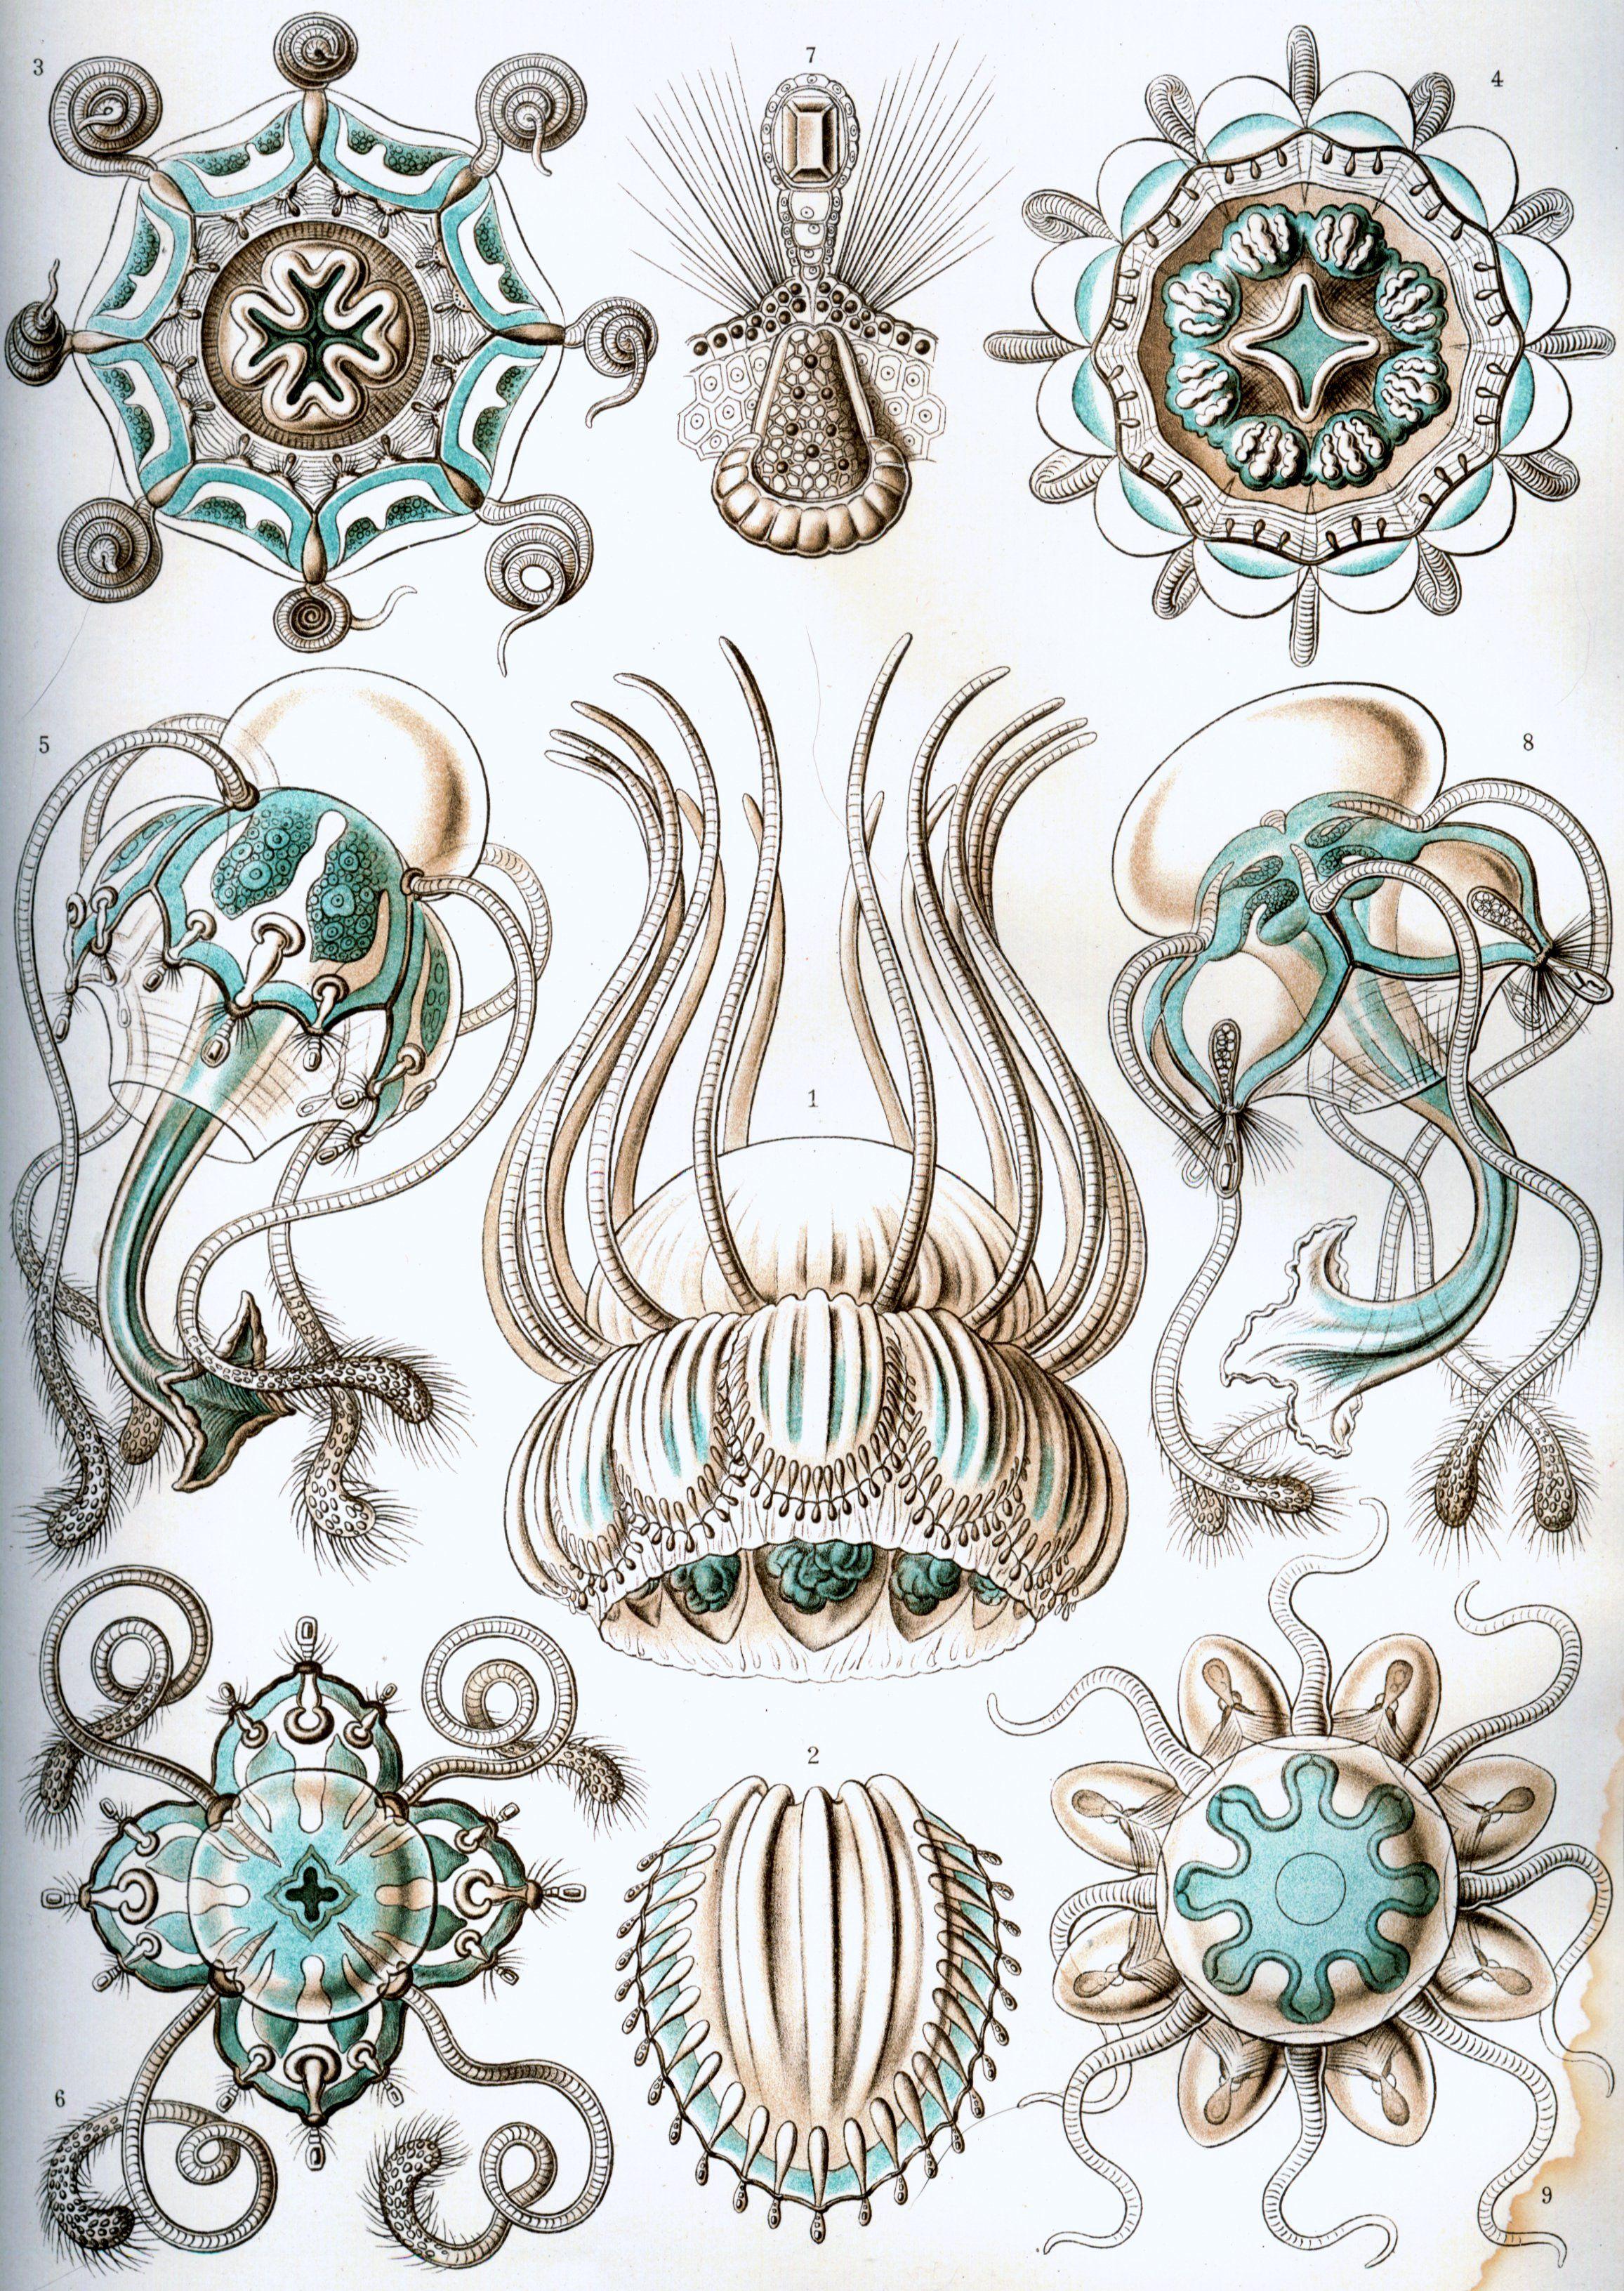 Haeckel narcomedusae